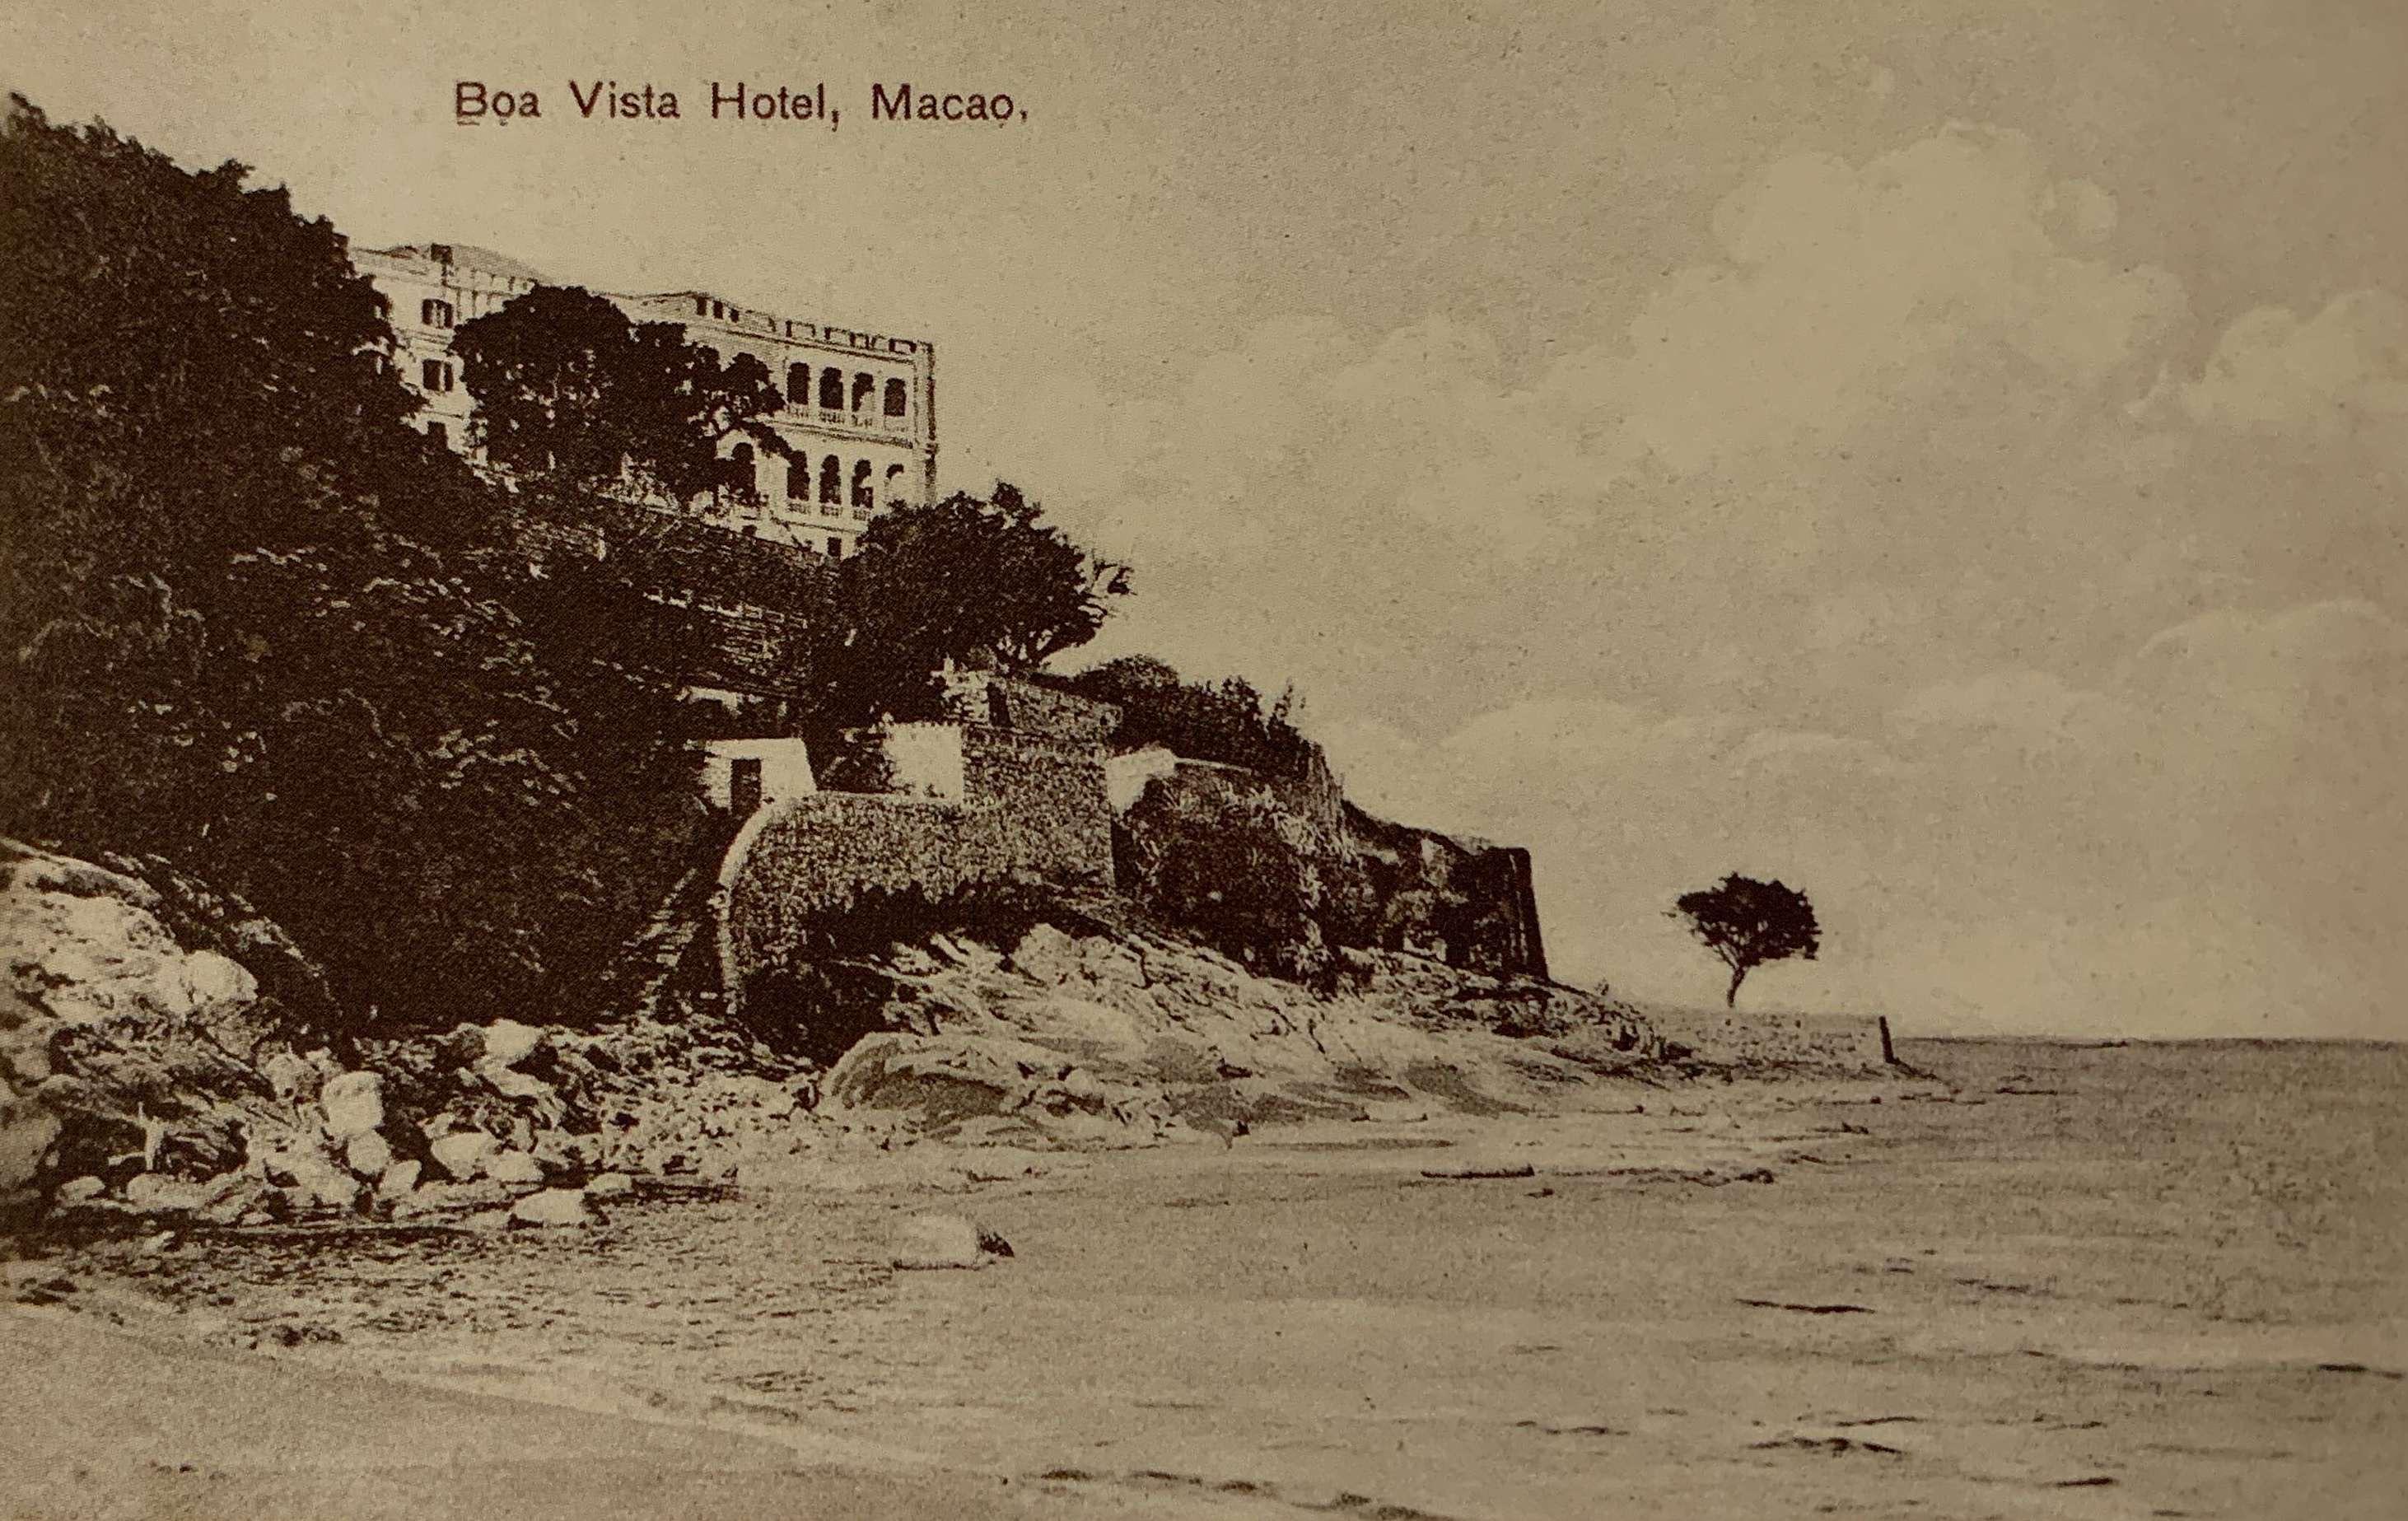 Old Postcard circa 1900 from Macau Antique Postcards by Joao Loureiro